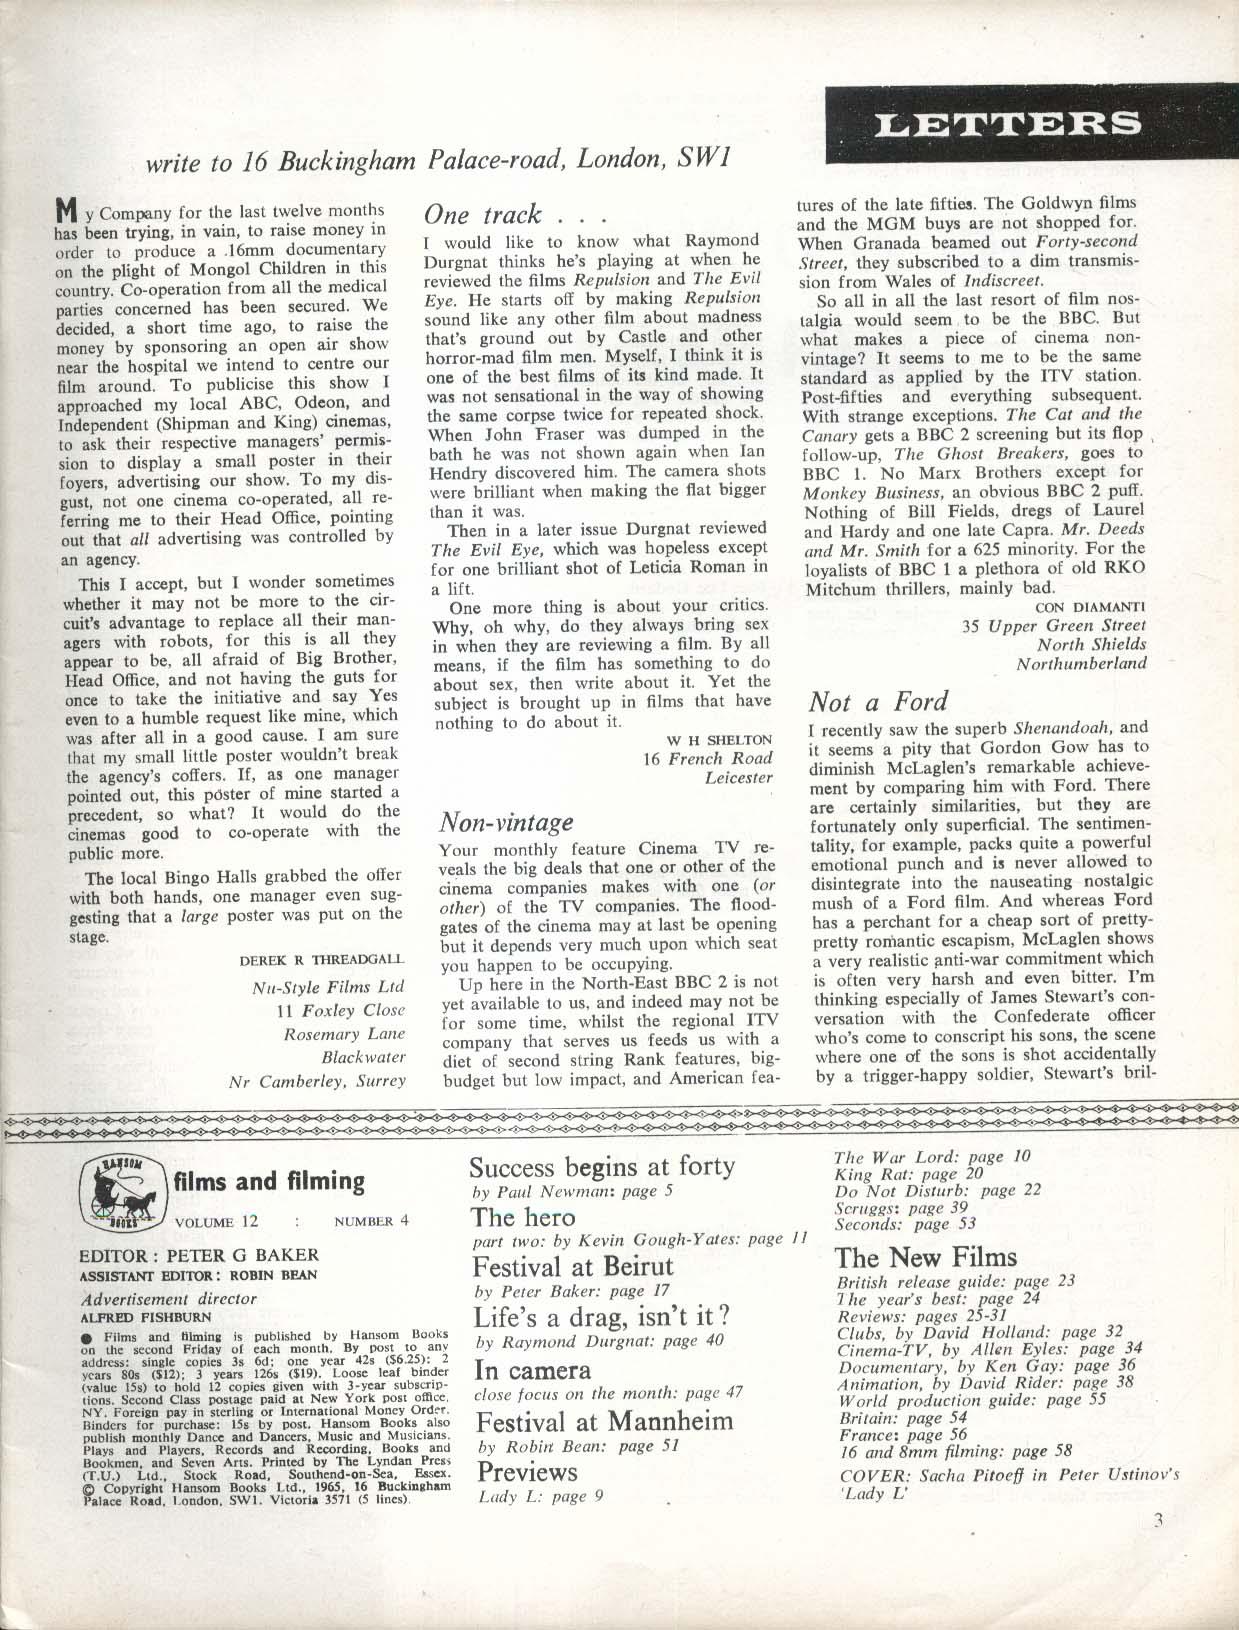 FILMS & FILMING Sacha Pitoeff Paul Newman 1 1966